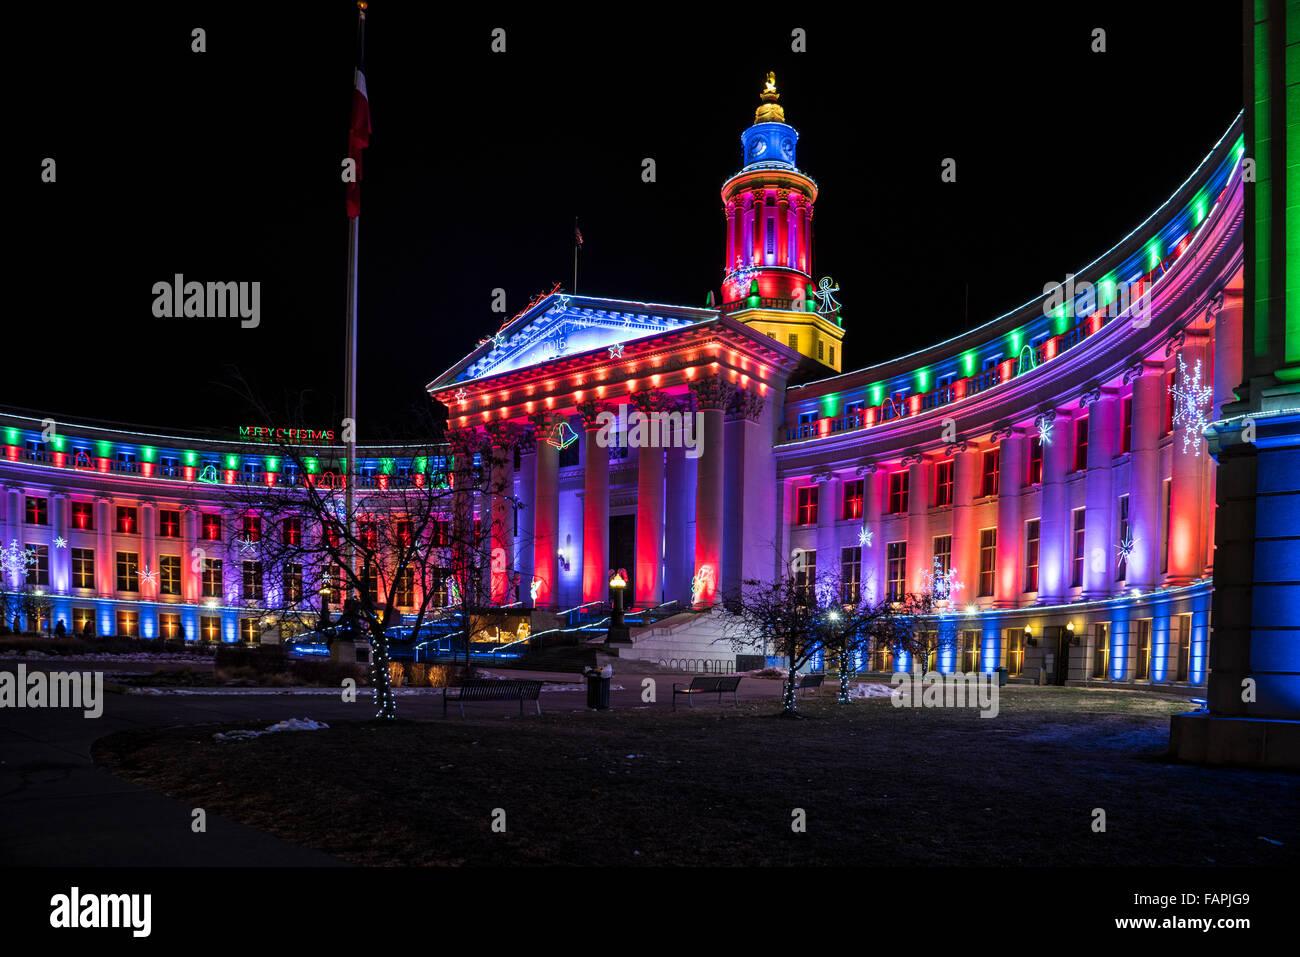 Christmas Lights On The Denver Colorado City And County